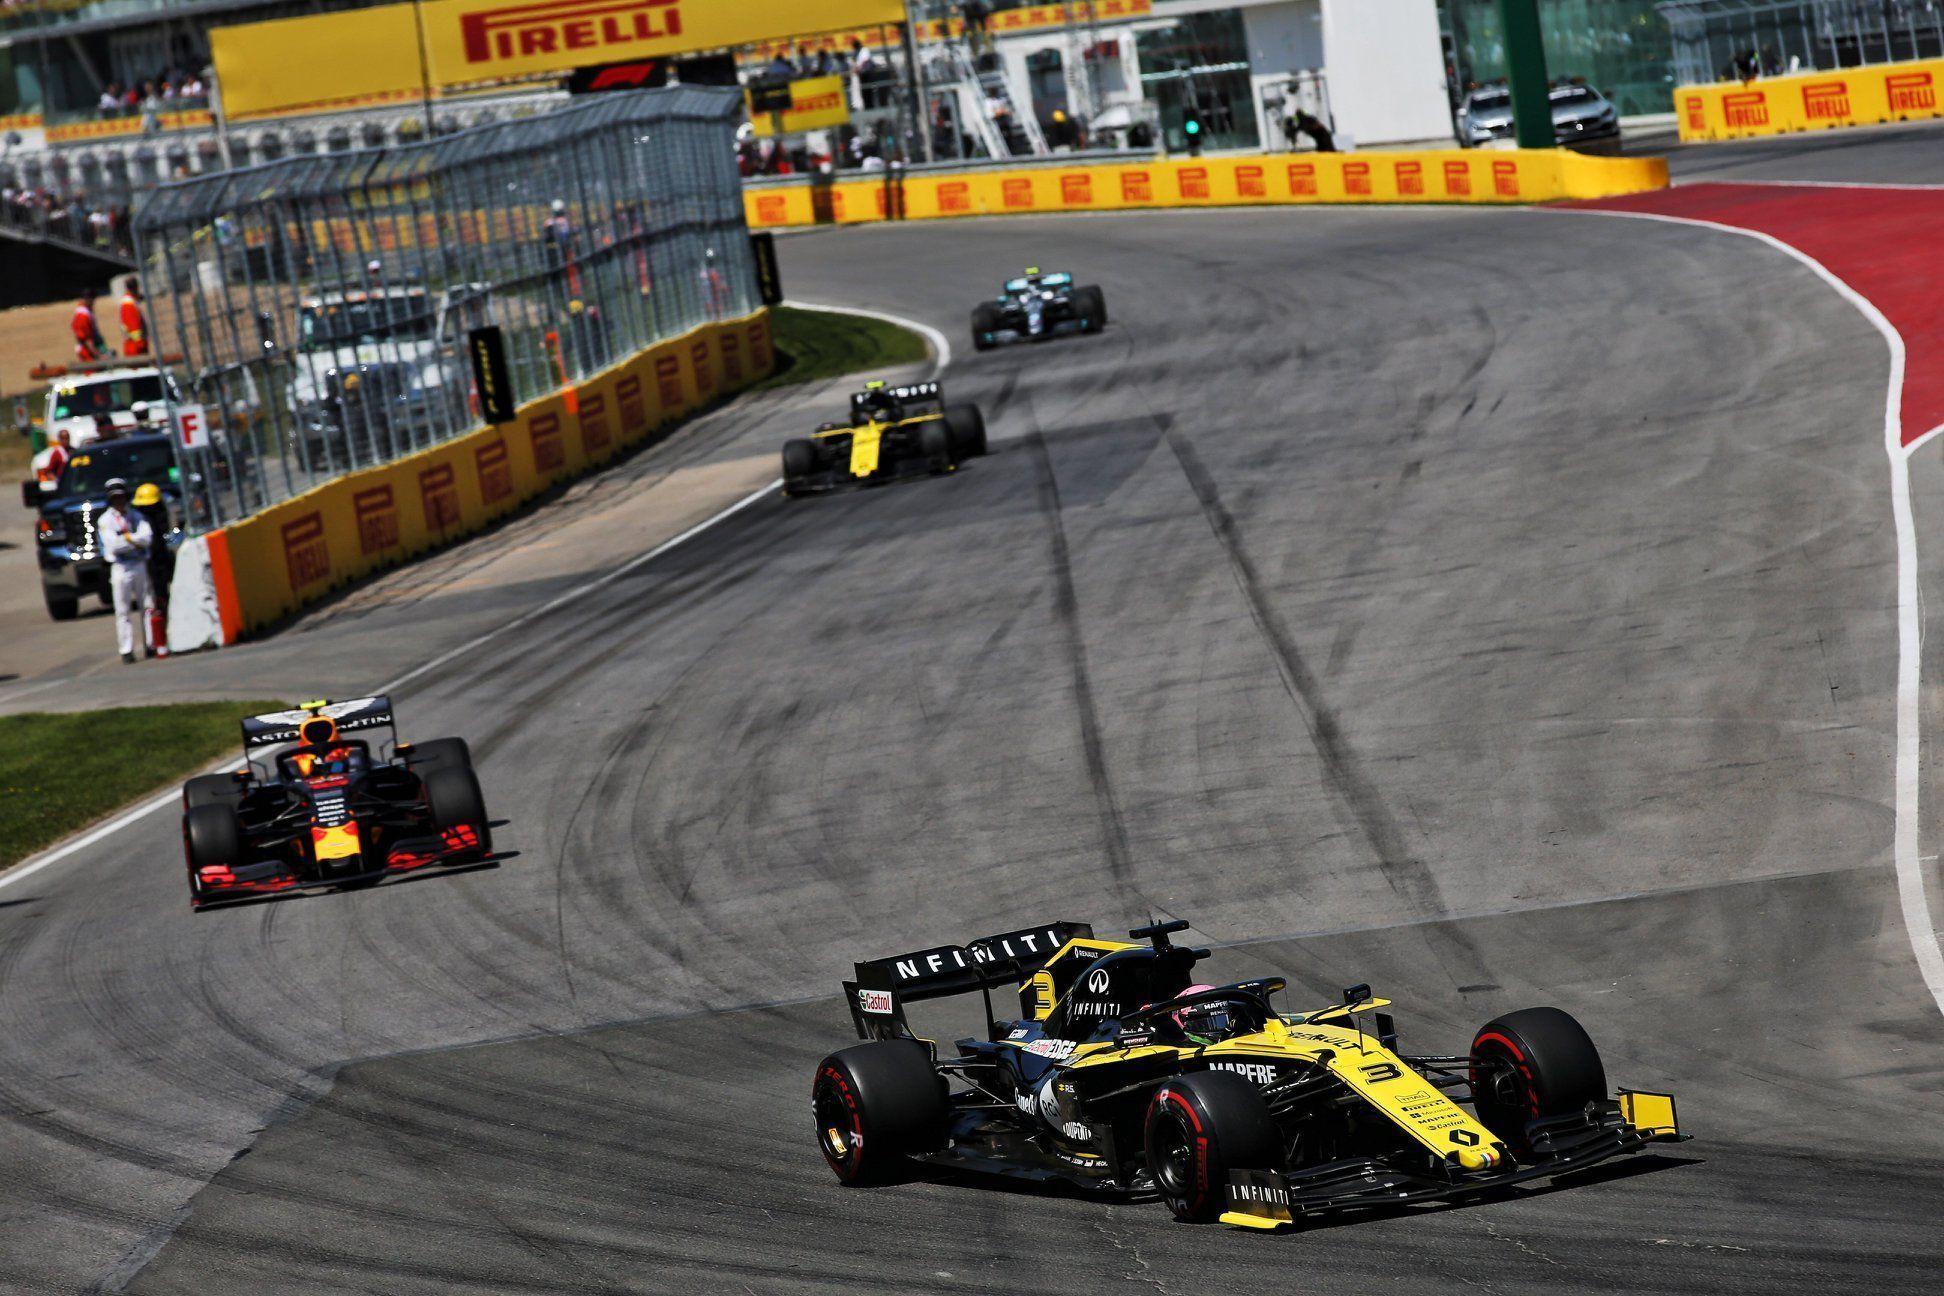 Daniel Ricciardo, F1, Canadian GP, Renault